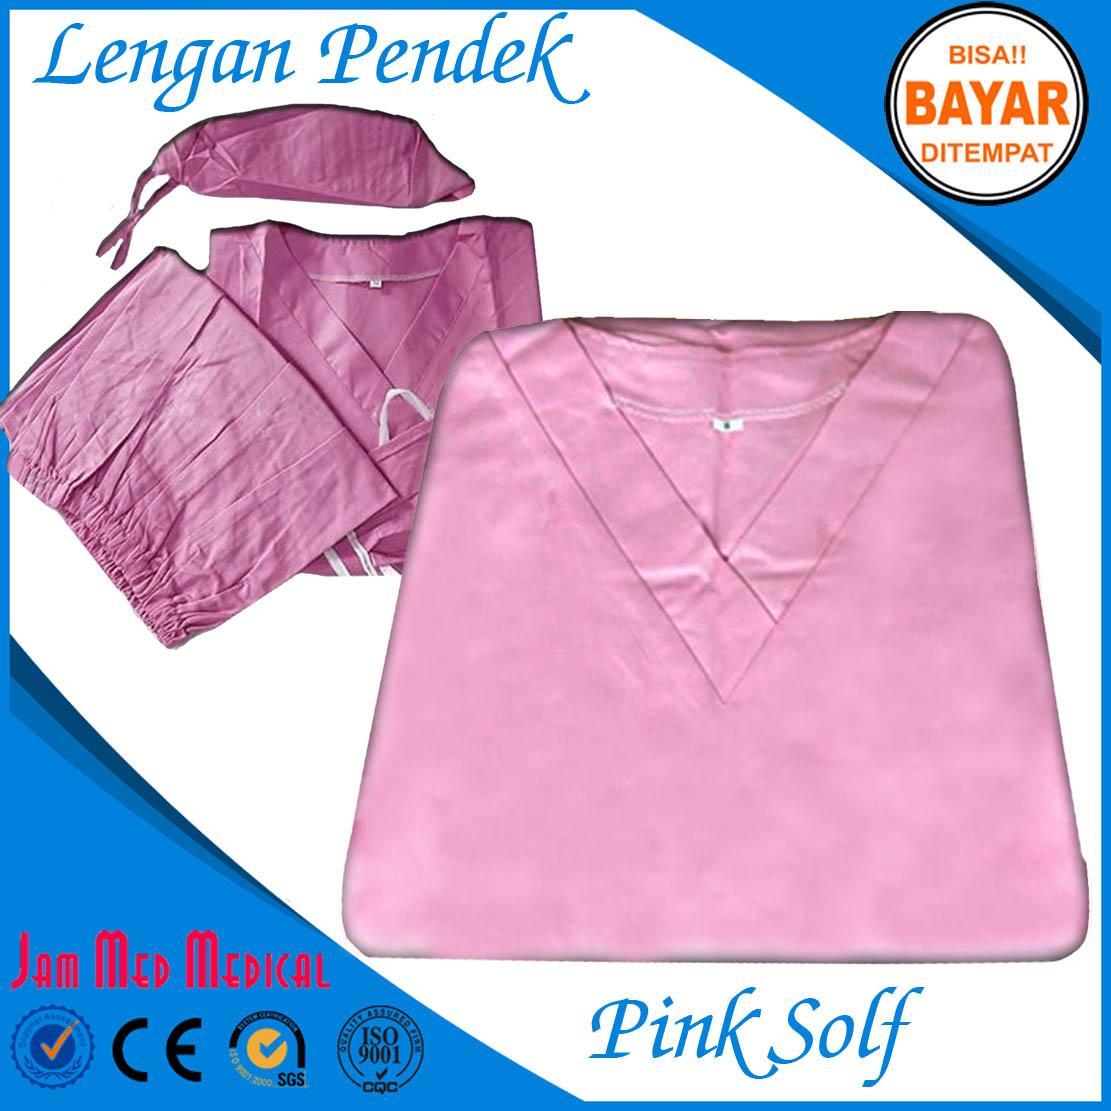 Buy Sell Cheapest Baju Oka Best Quality Product Deals Lengan Pendek Ok Jaga Warna Pink Soft